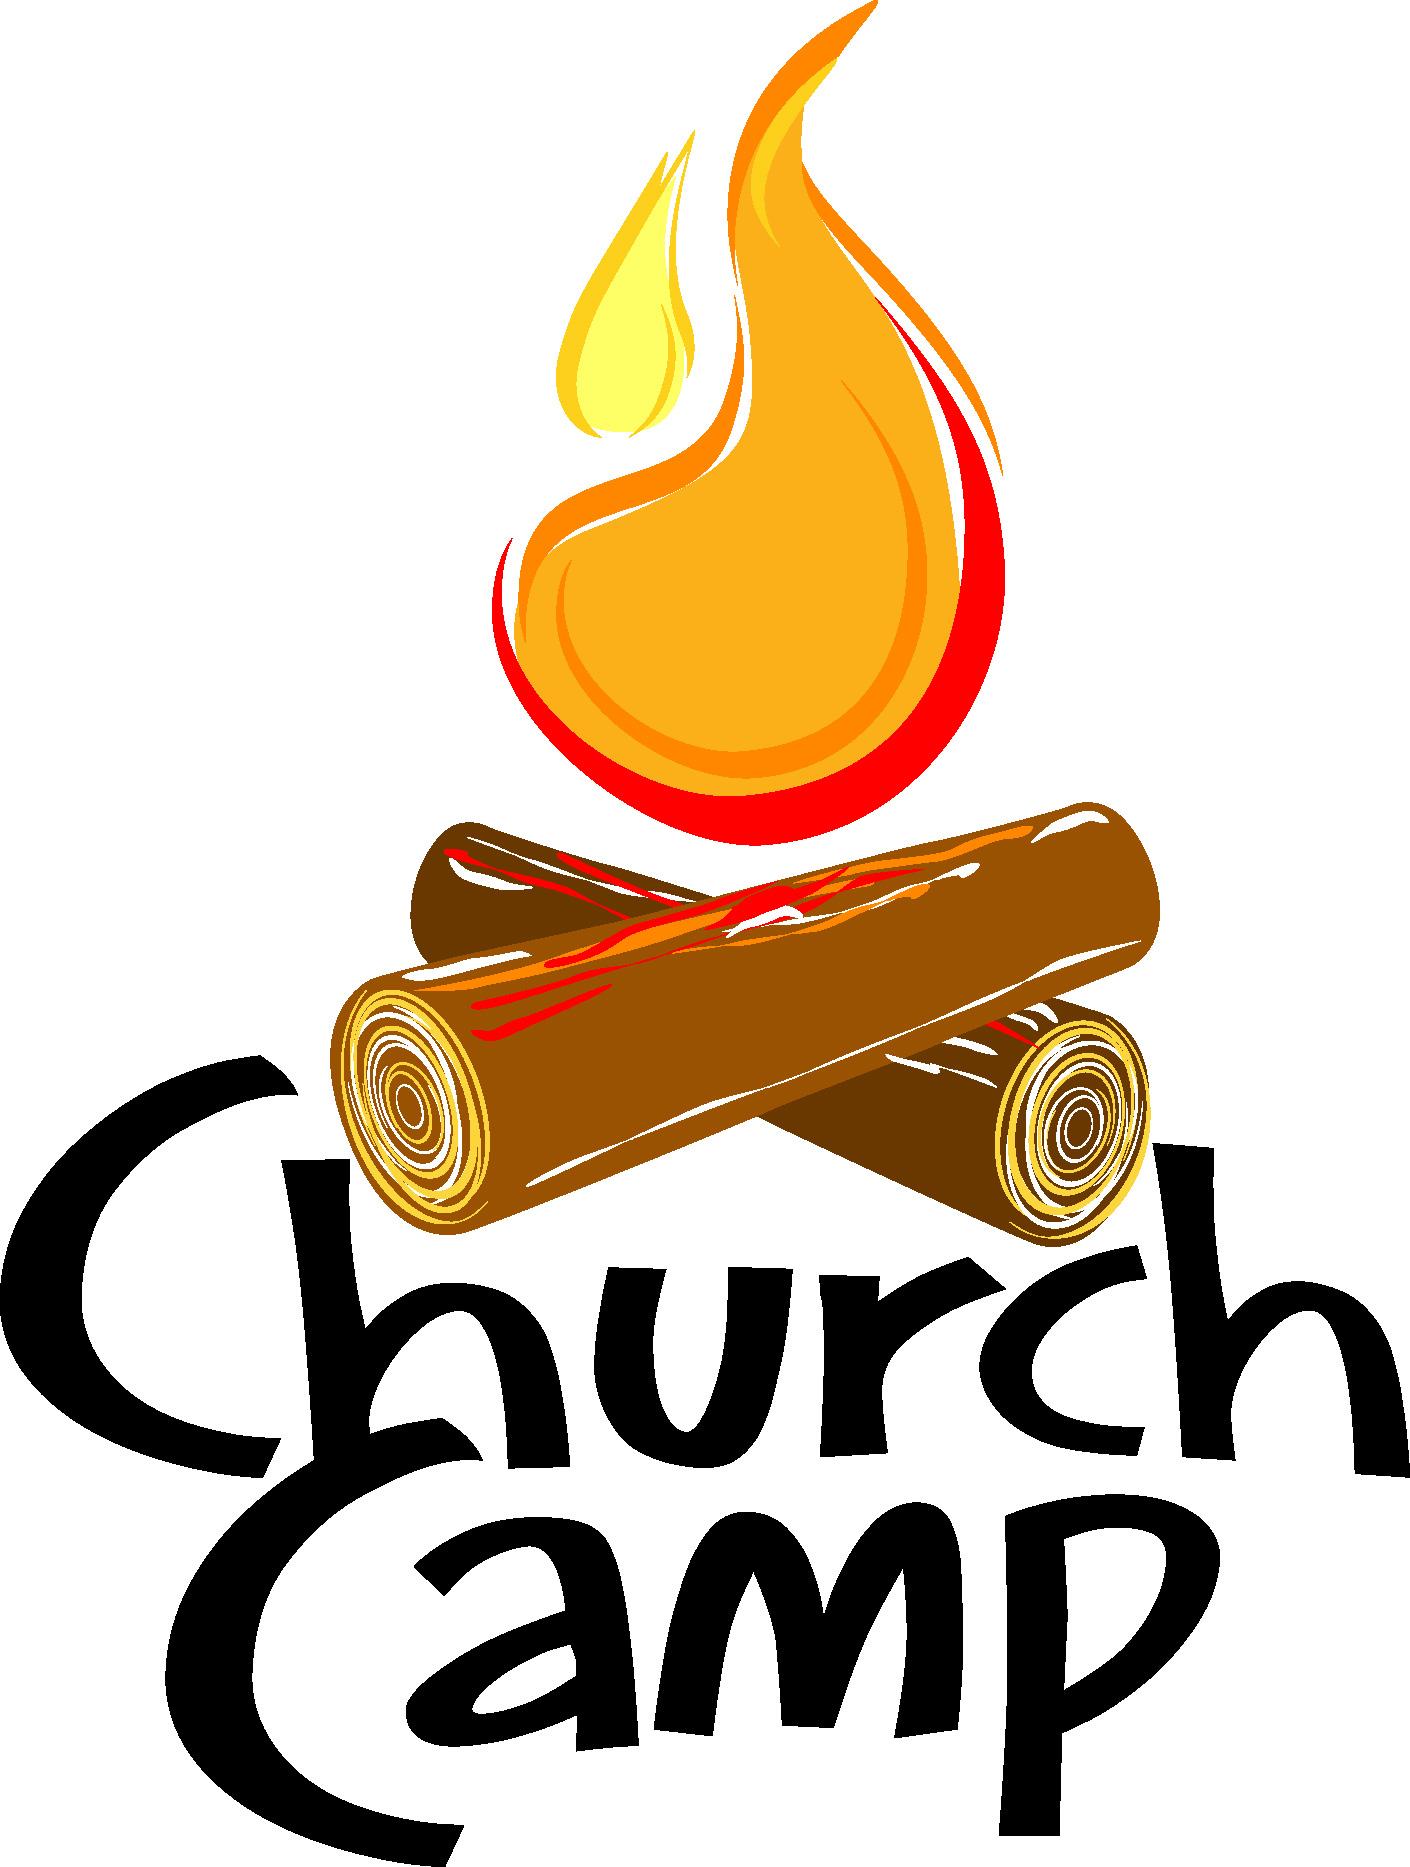 Camp chapel clipart freeuse Church Camp Clipart   Free download best Church Camp Clipart on ... freeuse